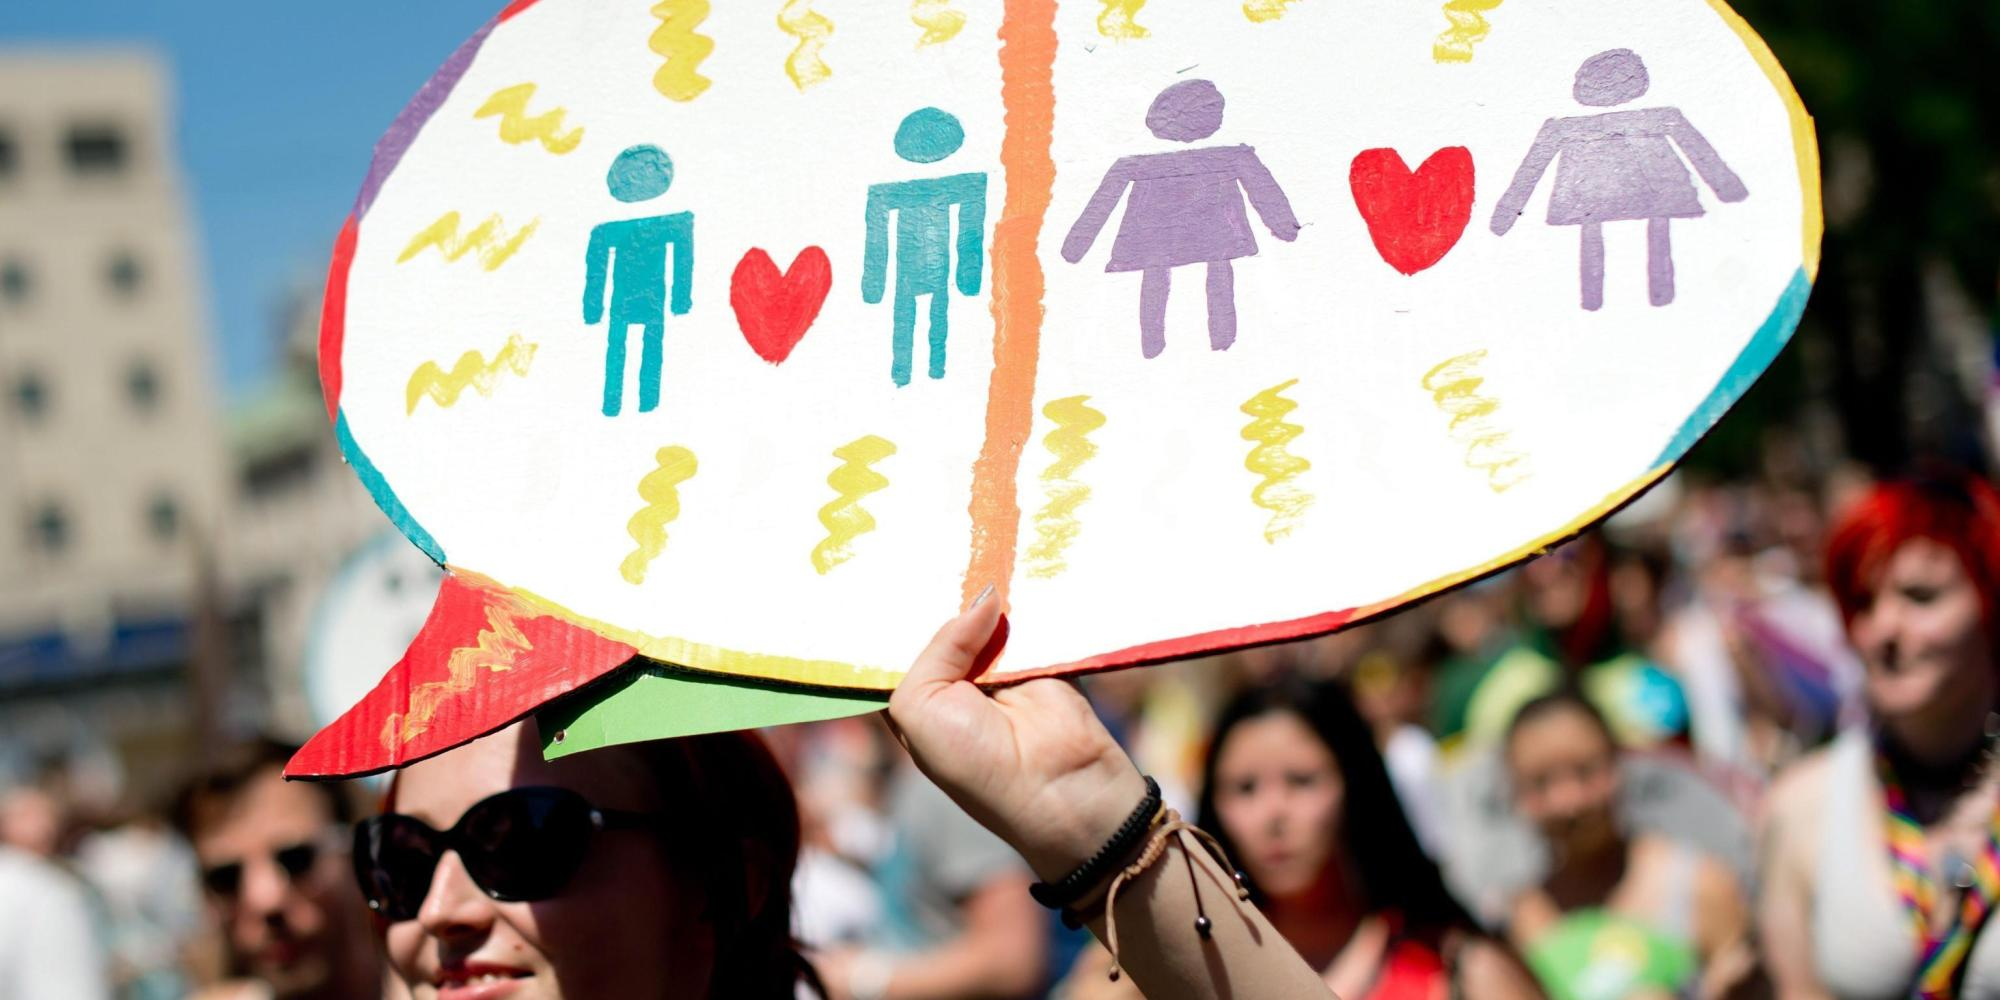 Trento, licenziata perché omosessuale